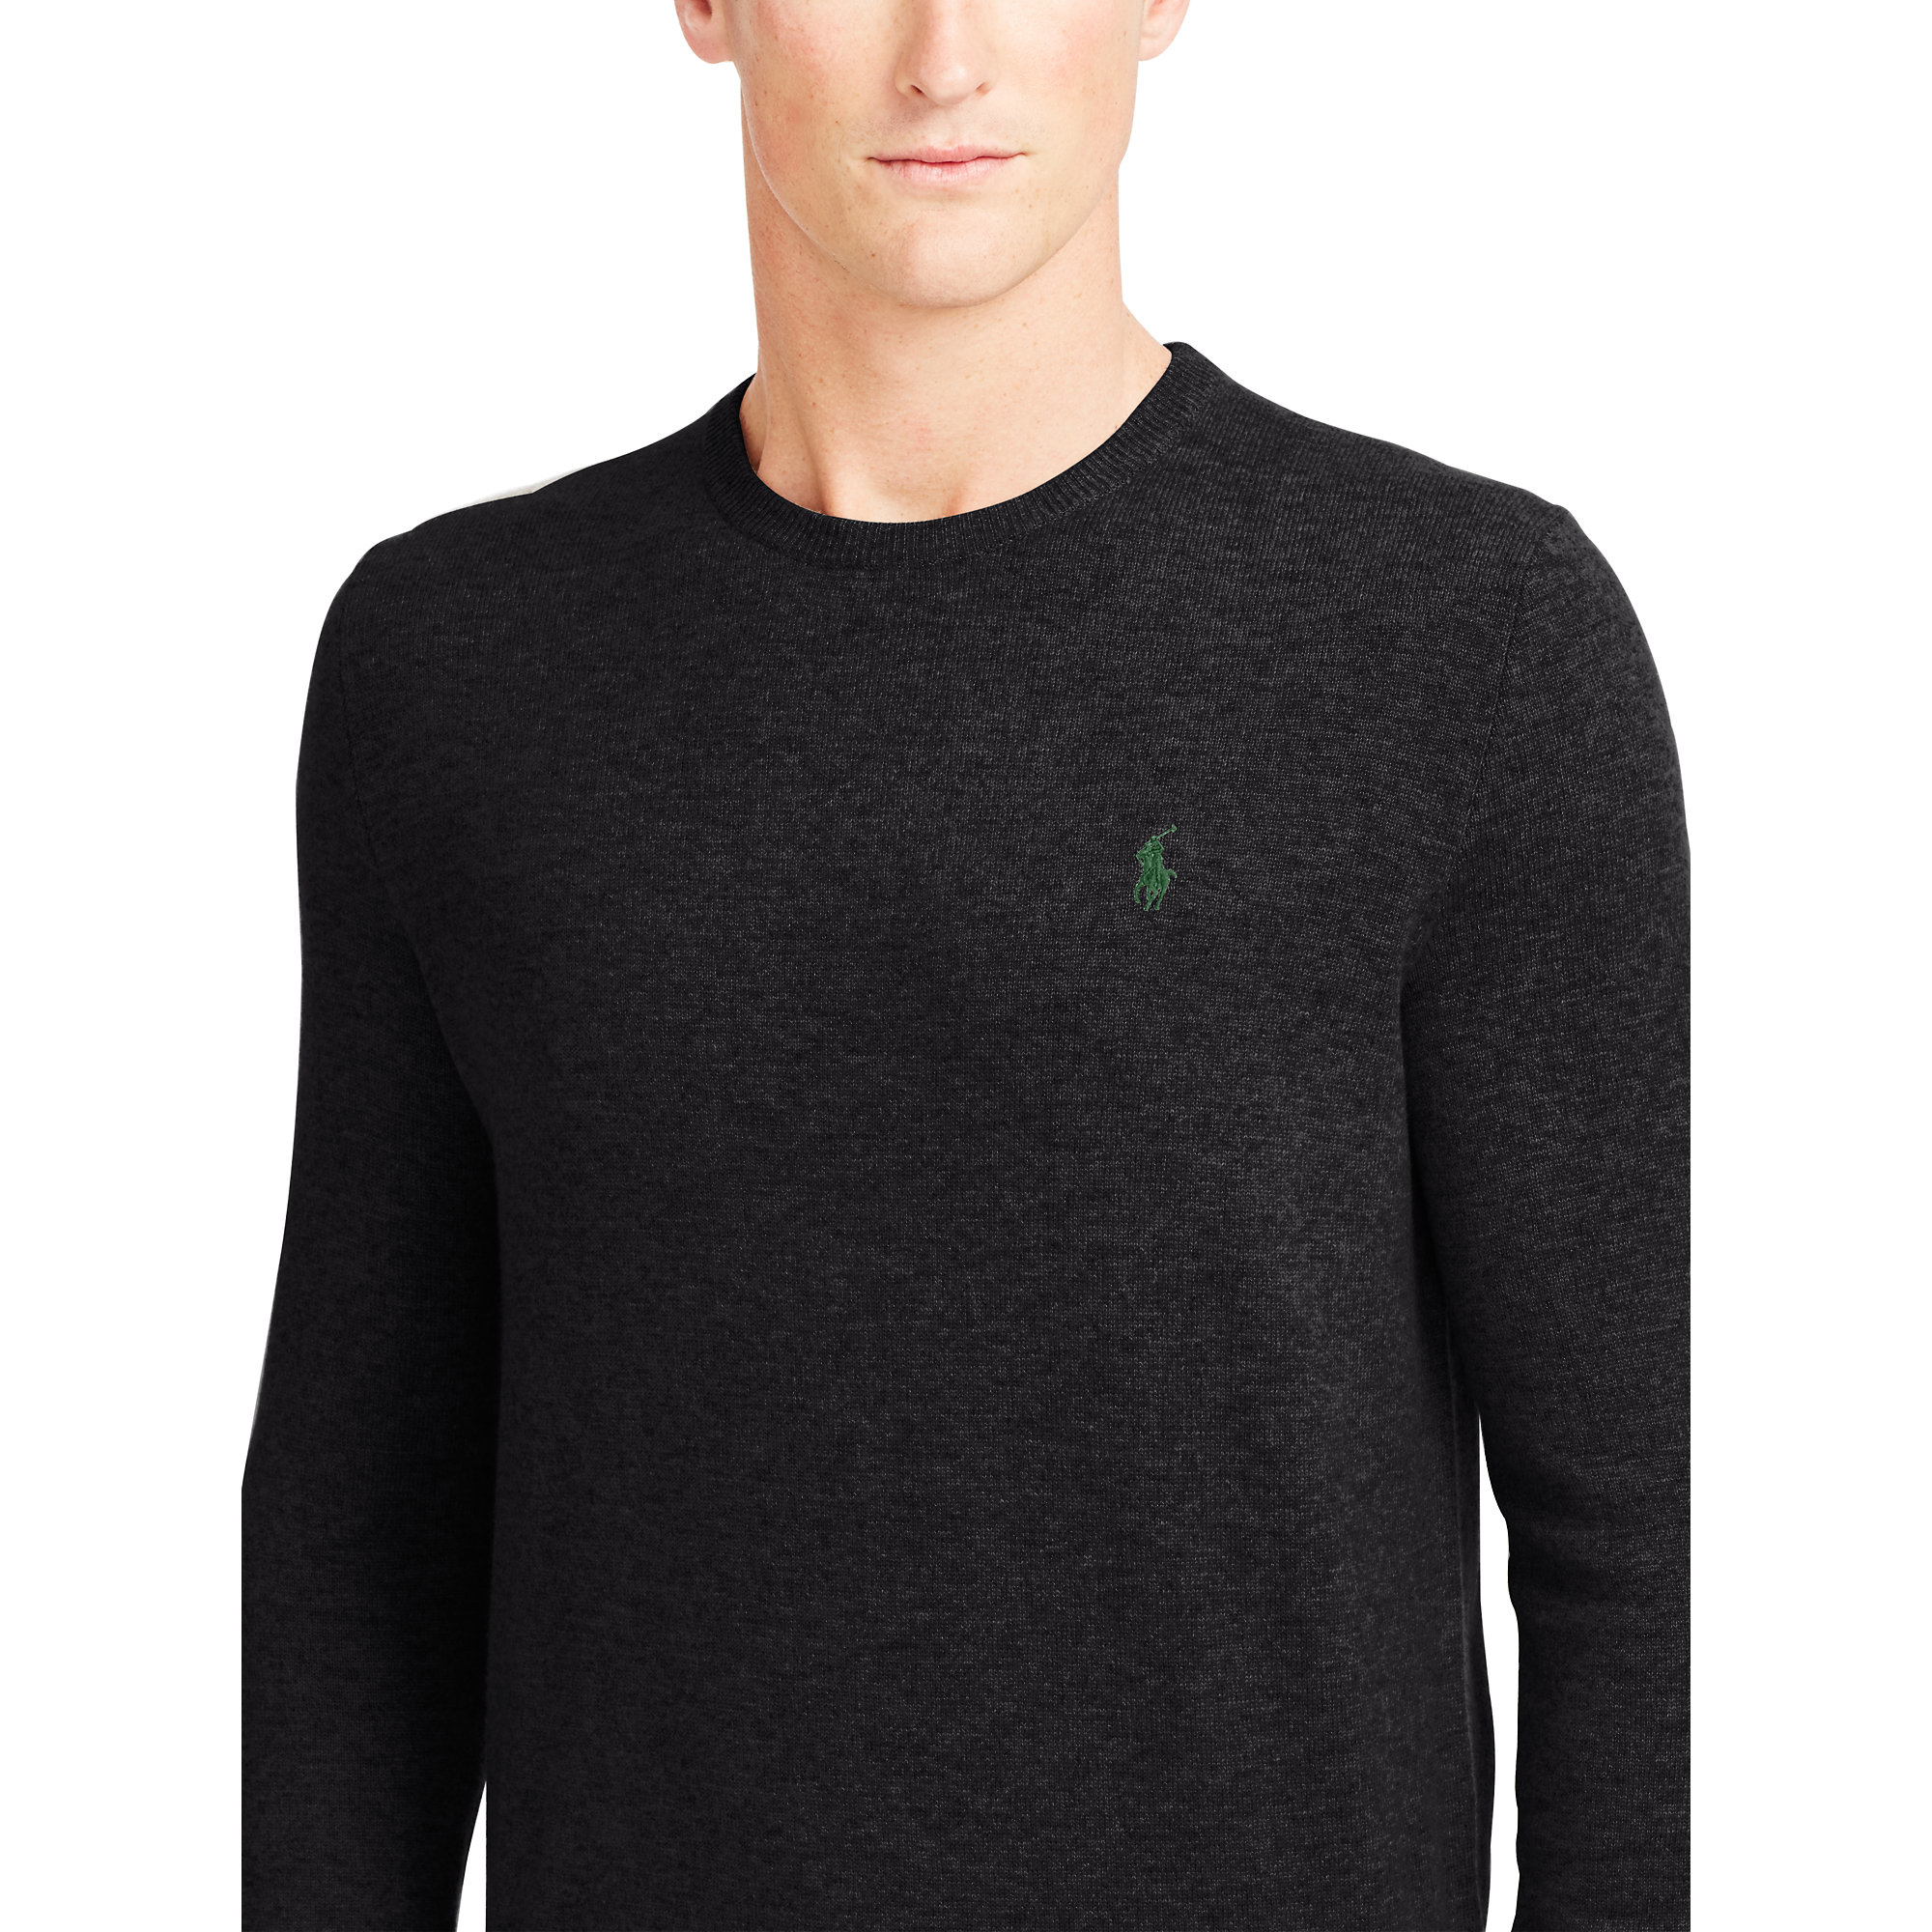 Lyst Polo Ralph Lauren Wool Crewneck Sweater In Black